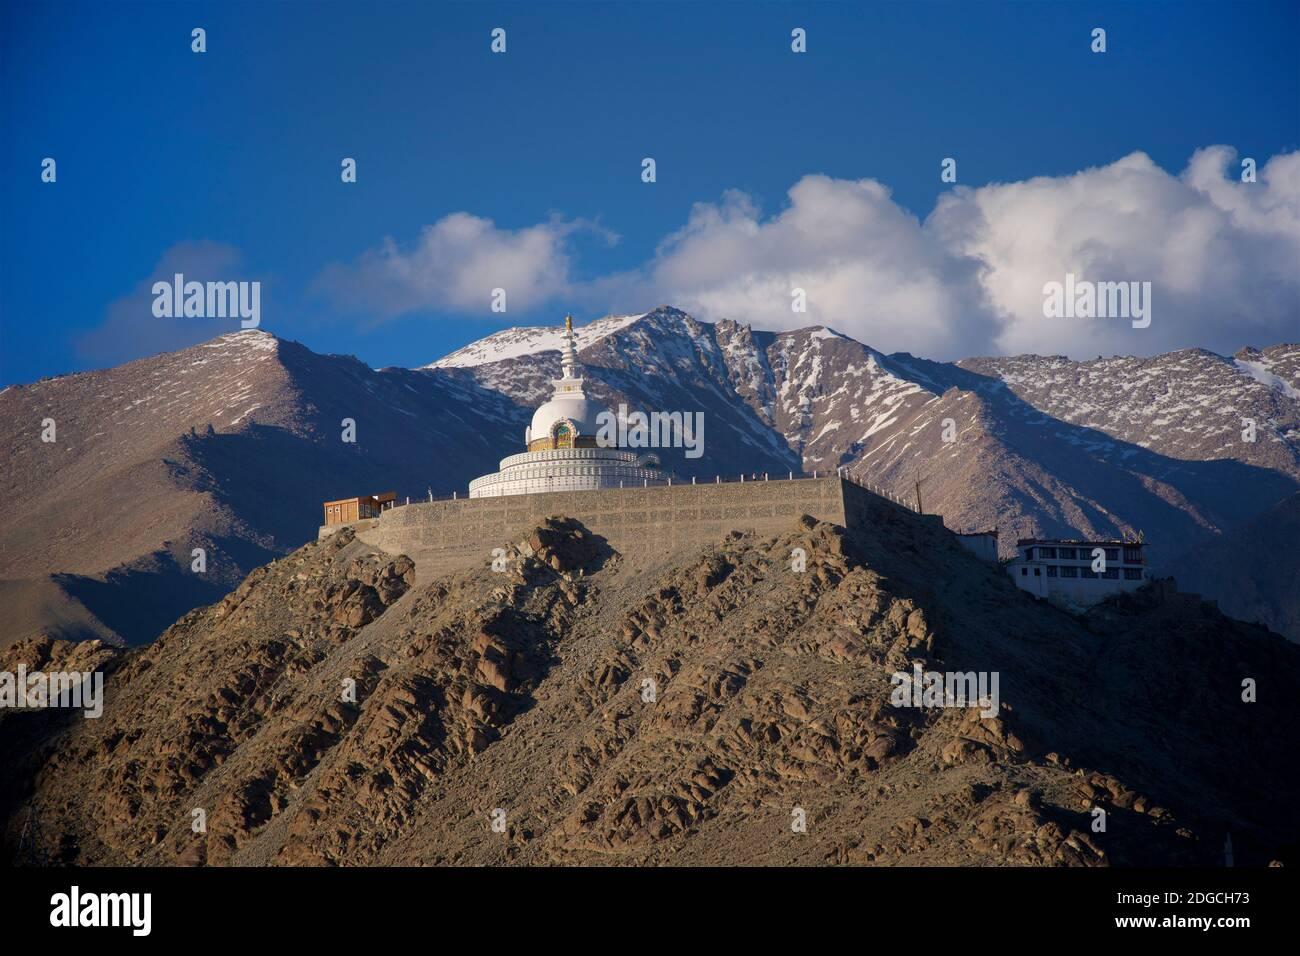 Shanti Stupa - a Buddhist white-domed stupa on a hilltop in Chanspa, Leh district, Ladakh, Jammu and Kashmir, India. Built in 1991 by Japanese Buddhist Bhikshu, Gyomyo Nakamura & part of the Peace Pagoda mission. The Shanti Stupa holds the relics of the Buddha at its base, enshrined by the 14th Dalai Lama. Ladakh, Stock Photo